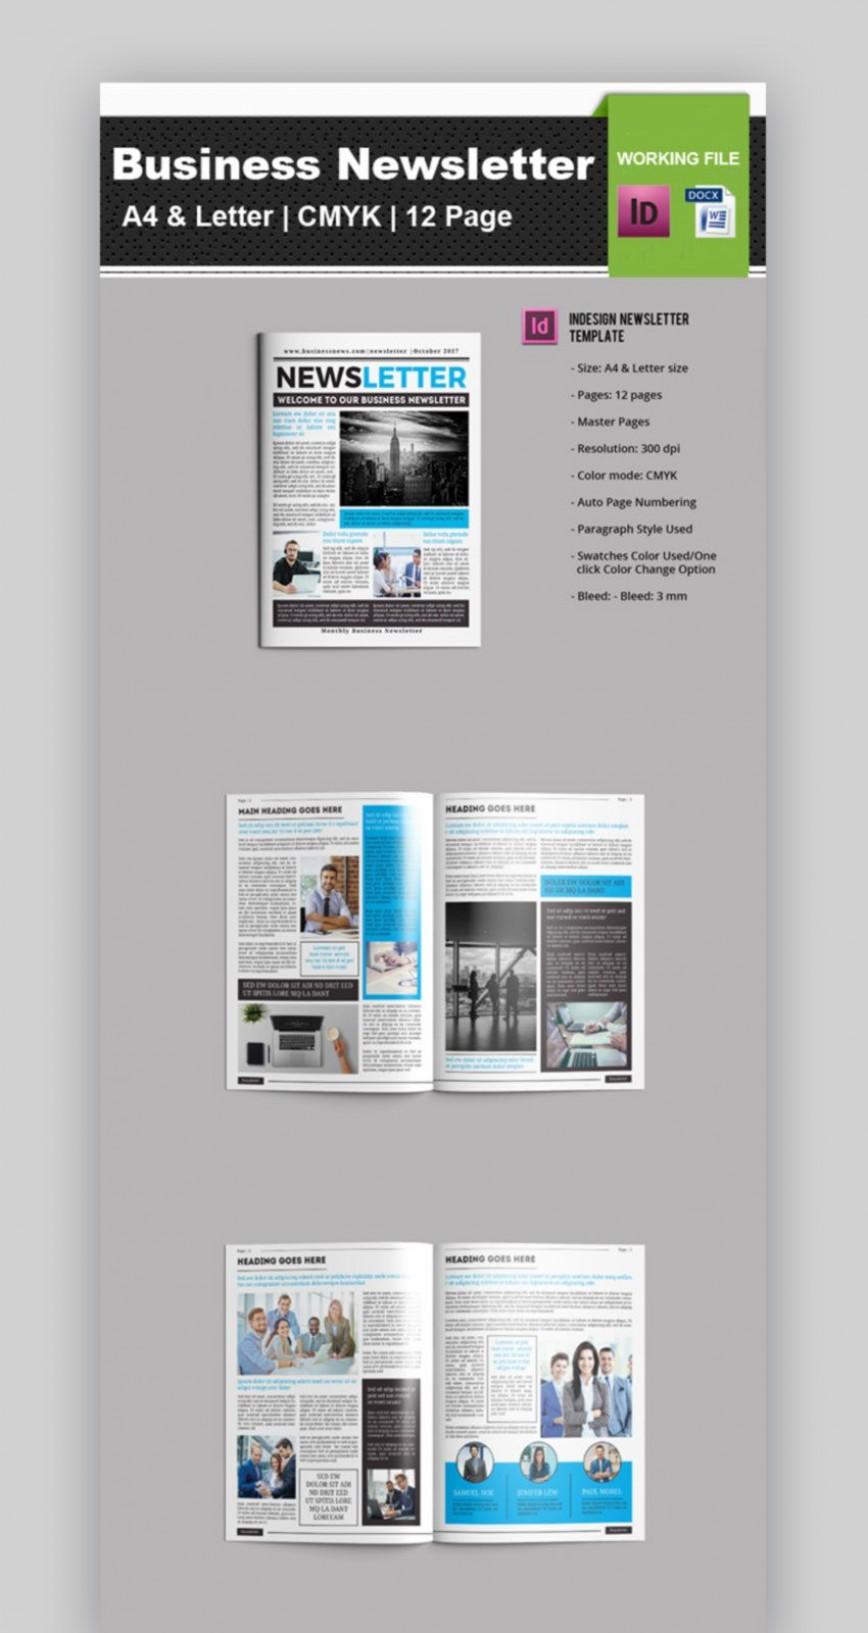 006 Sensational Publisher Newsletter Template Free Inspiration  Microsoft Office Download868